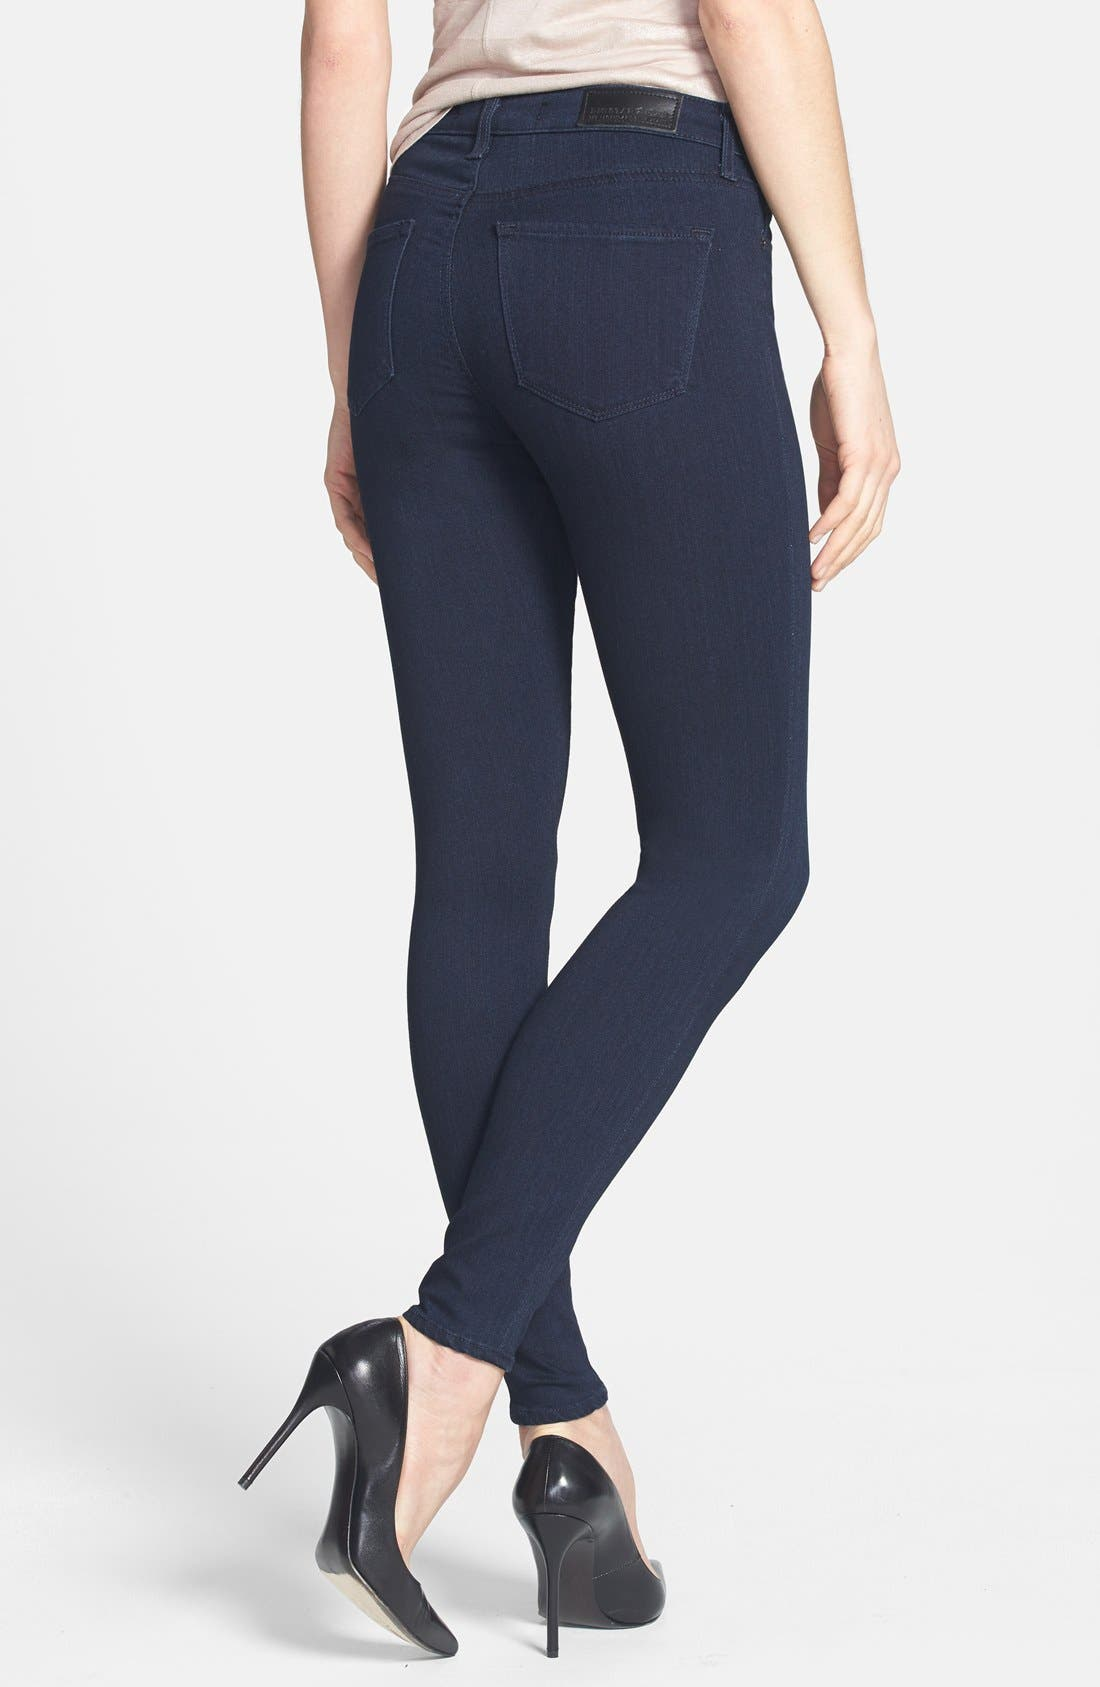 Alternate Image 2  - Big Star 'Ava' Jeans Super Skinny Stretch Jeans (Harmony Dark) (Petite)